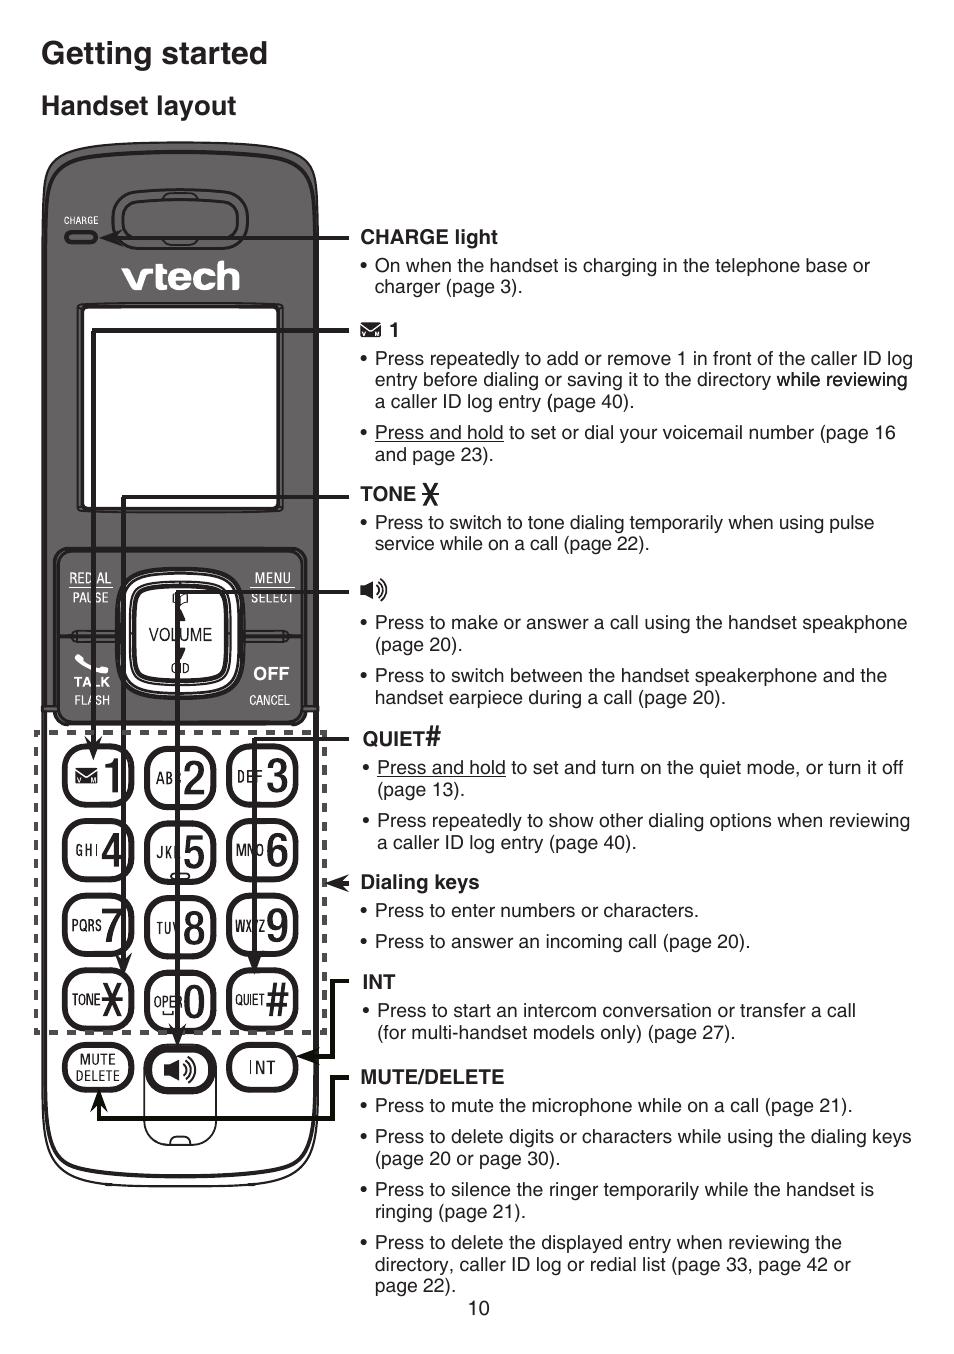 Getting Started Handset Layout Vtech Cs6829 Manual User Manual